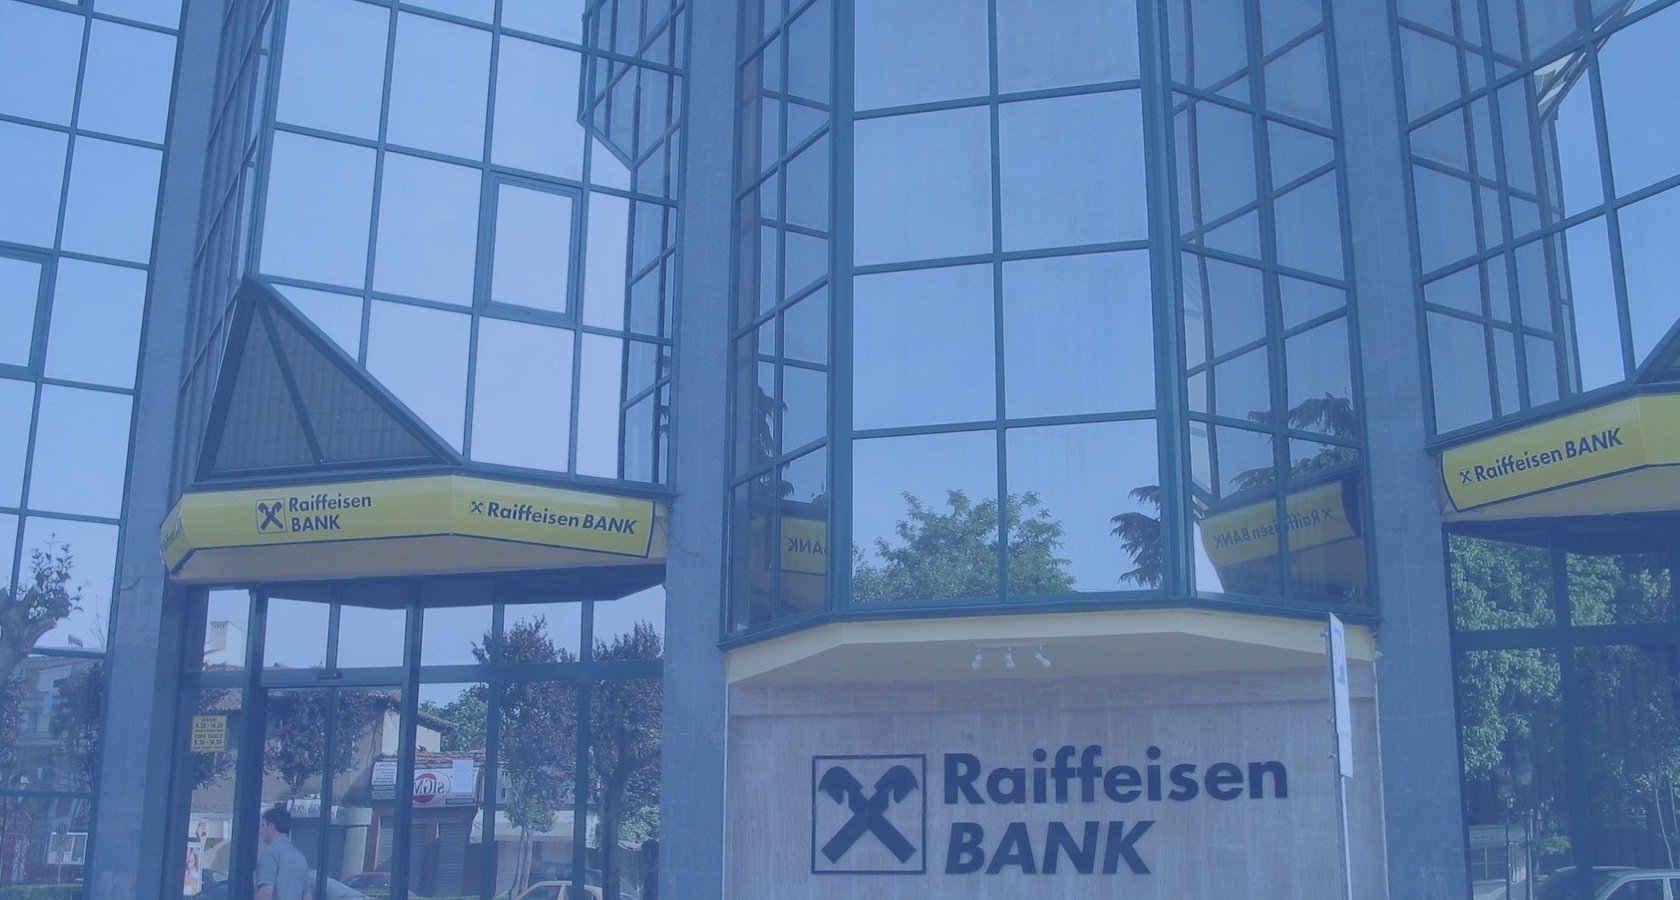 RĄPAŁA Law Firm has supported the Raiffeisen Bank Polska S.A.